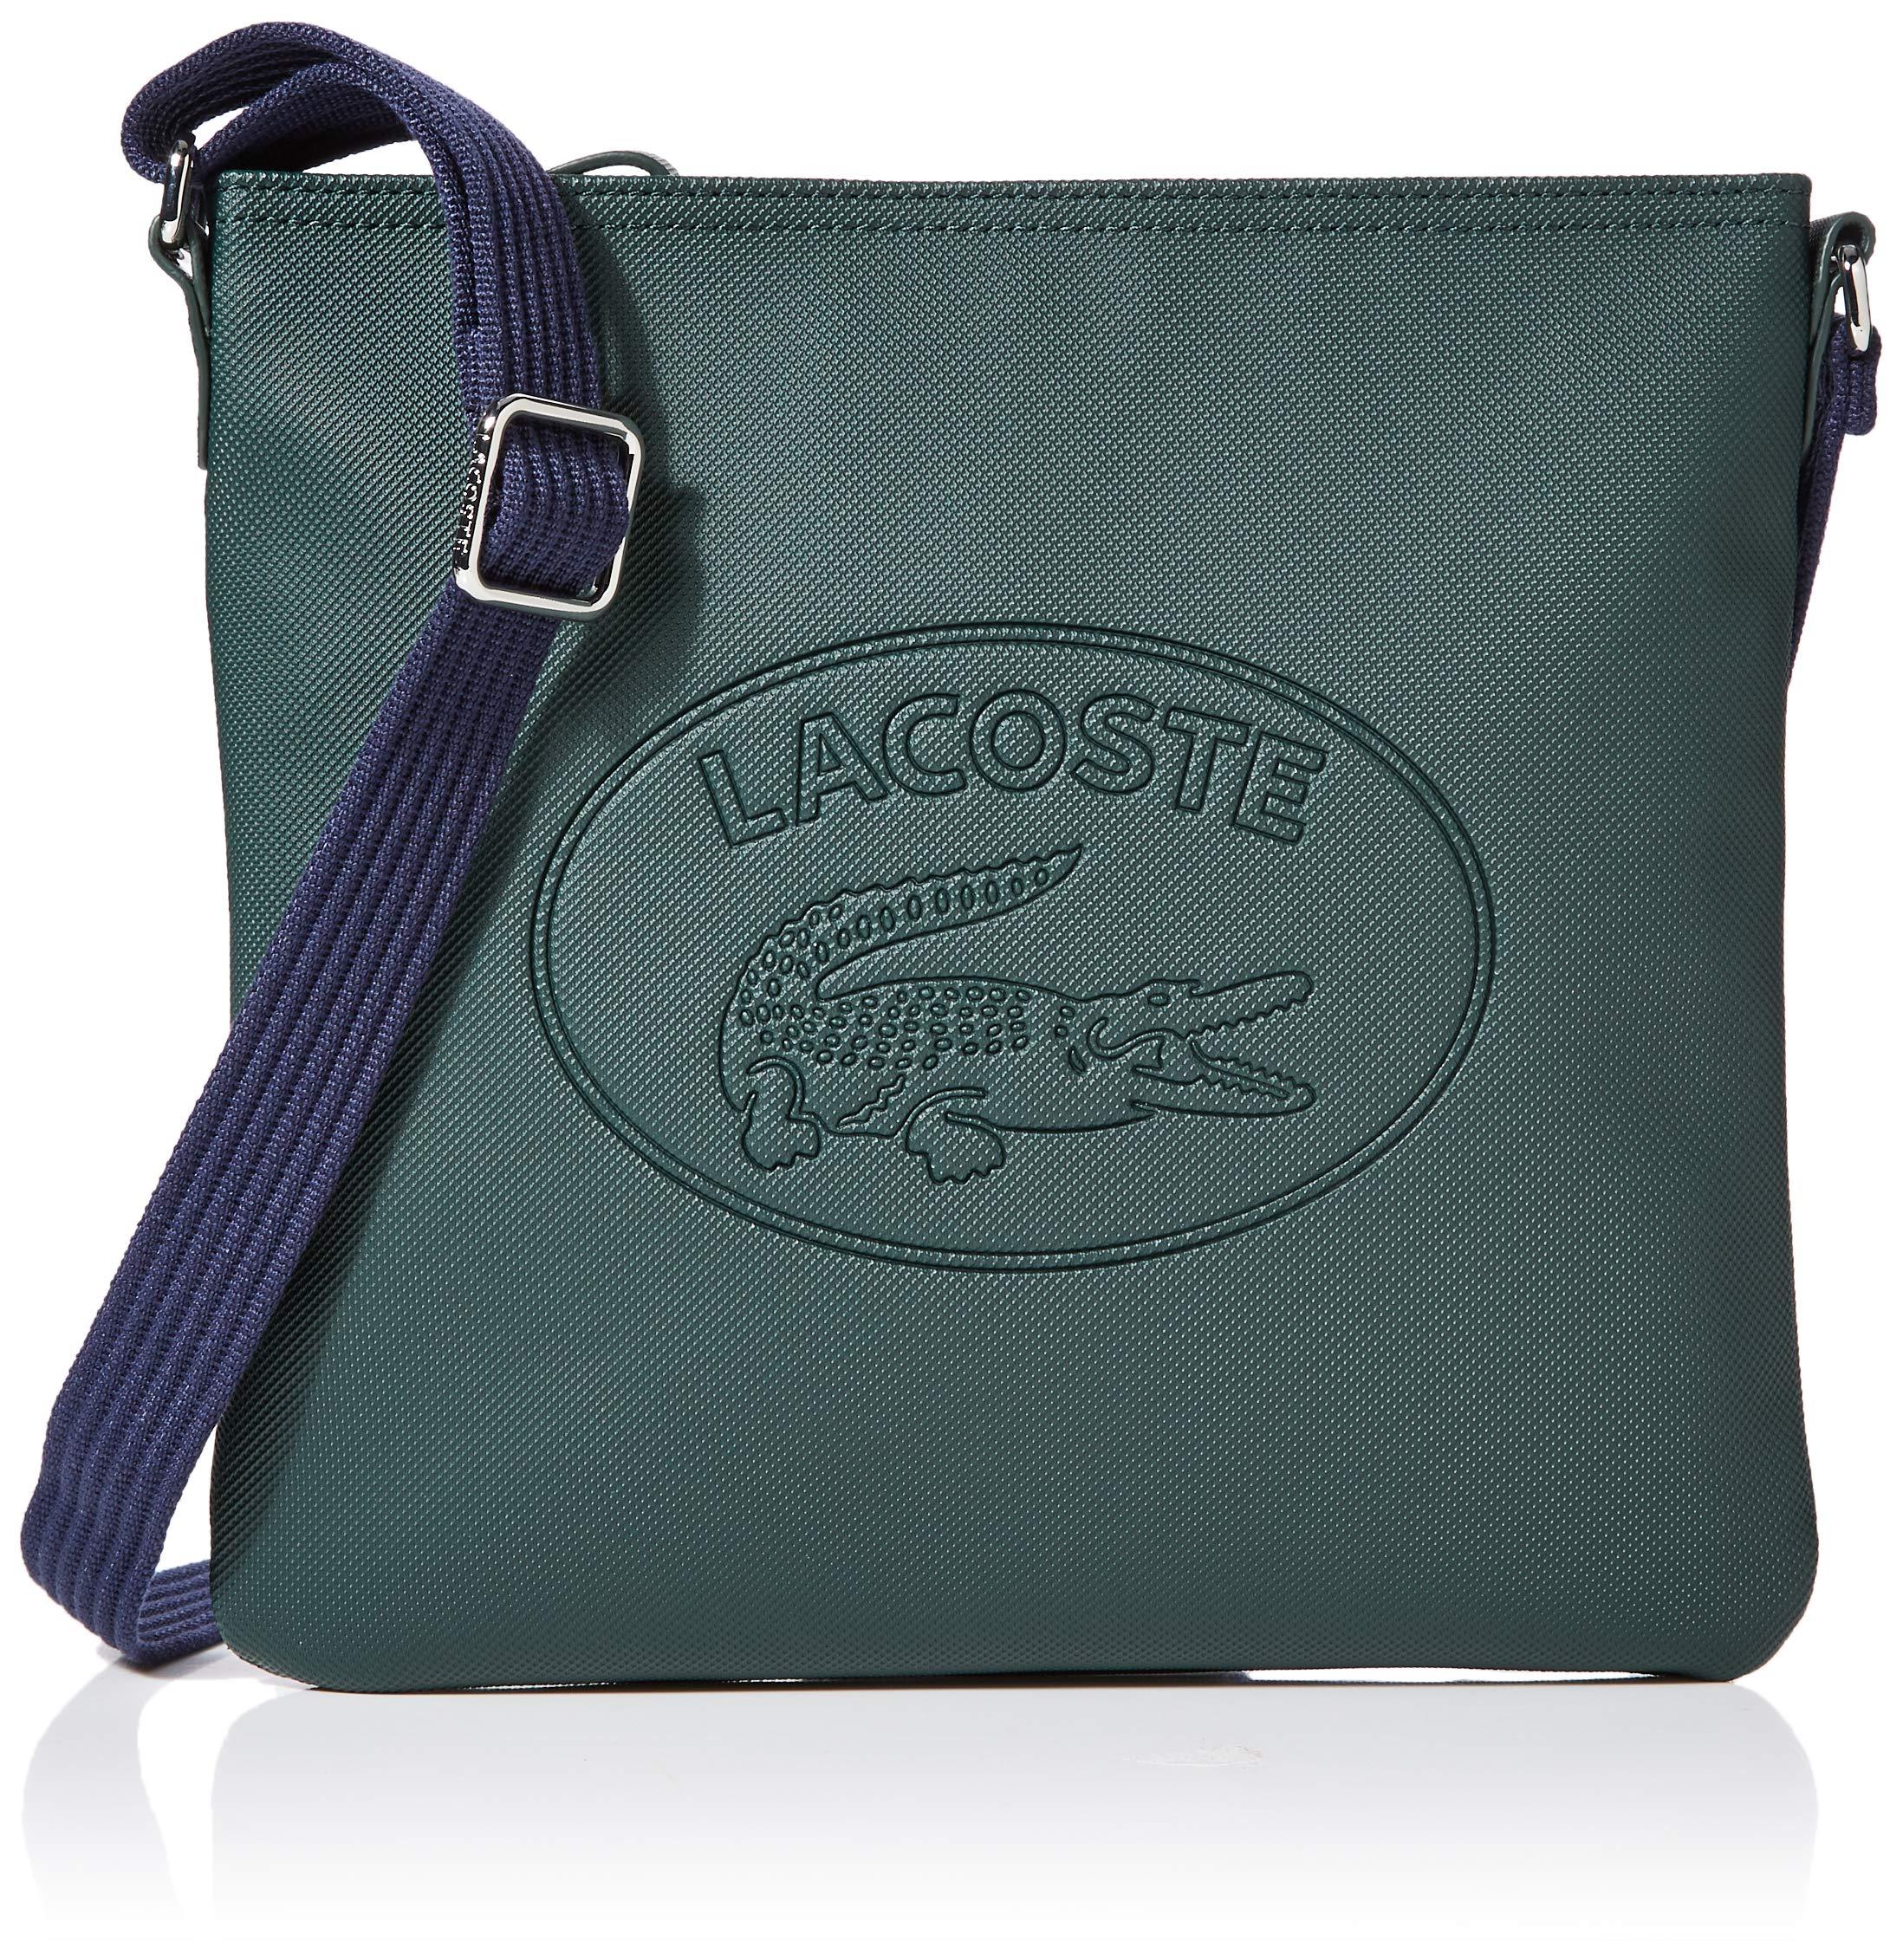 Epaule Lacoste Corn Classic Sac Femme Women's Porte Bleuscarab Peacoat Y76gyfb